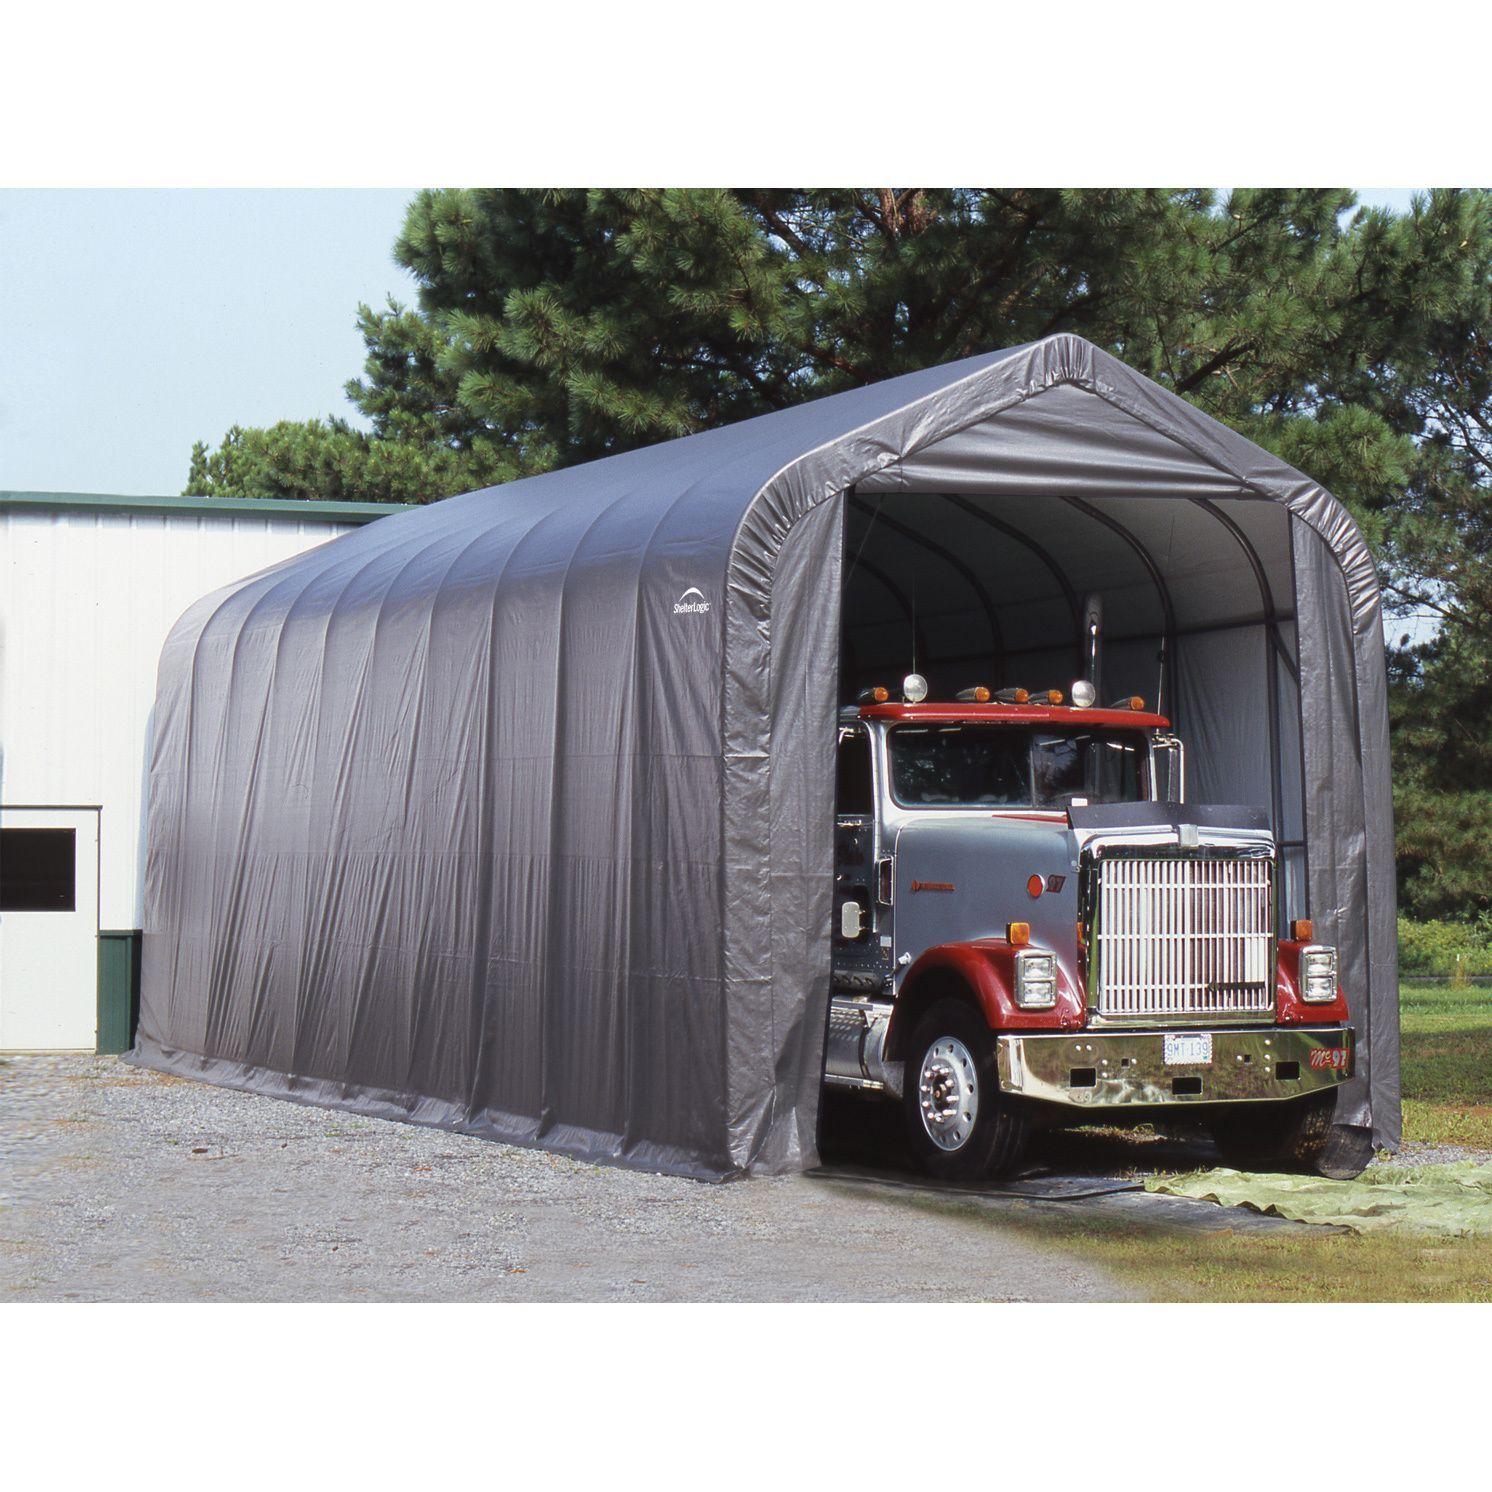 ft and farm garage fleet shelterlogic tent shed a in storage box wayfair st x sc